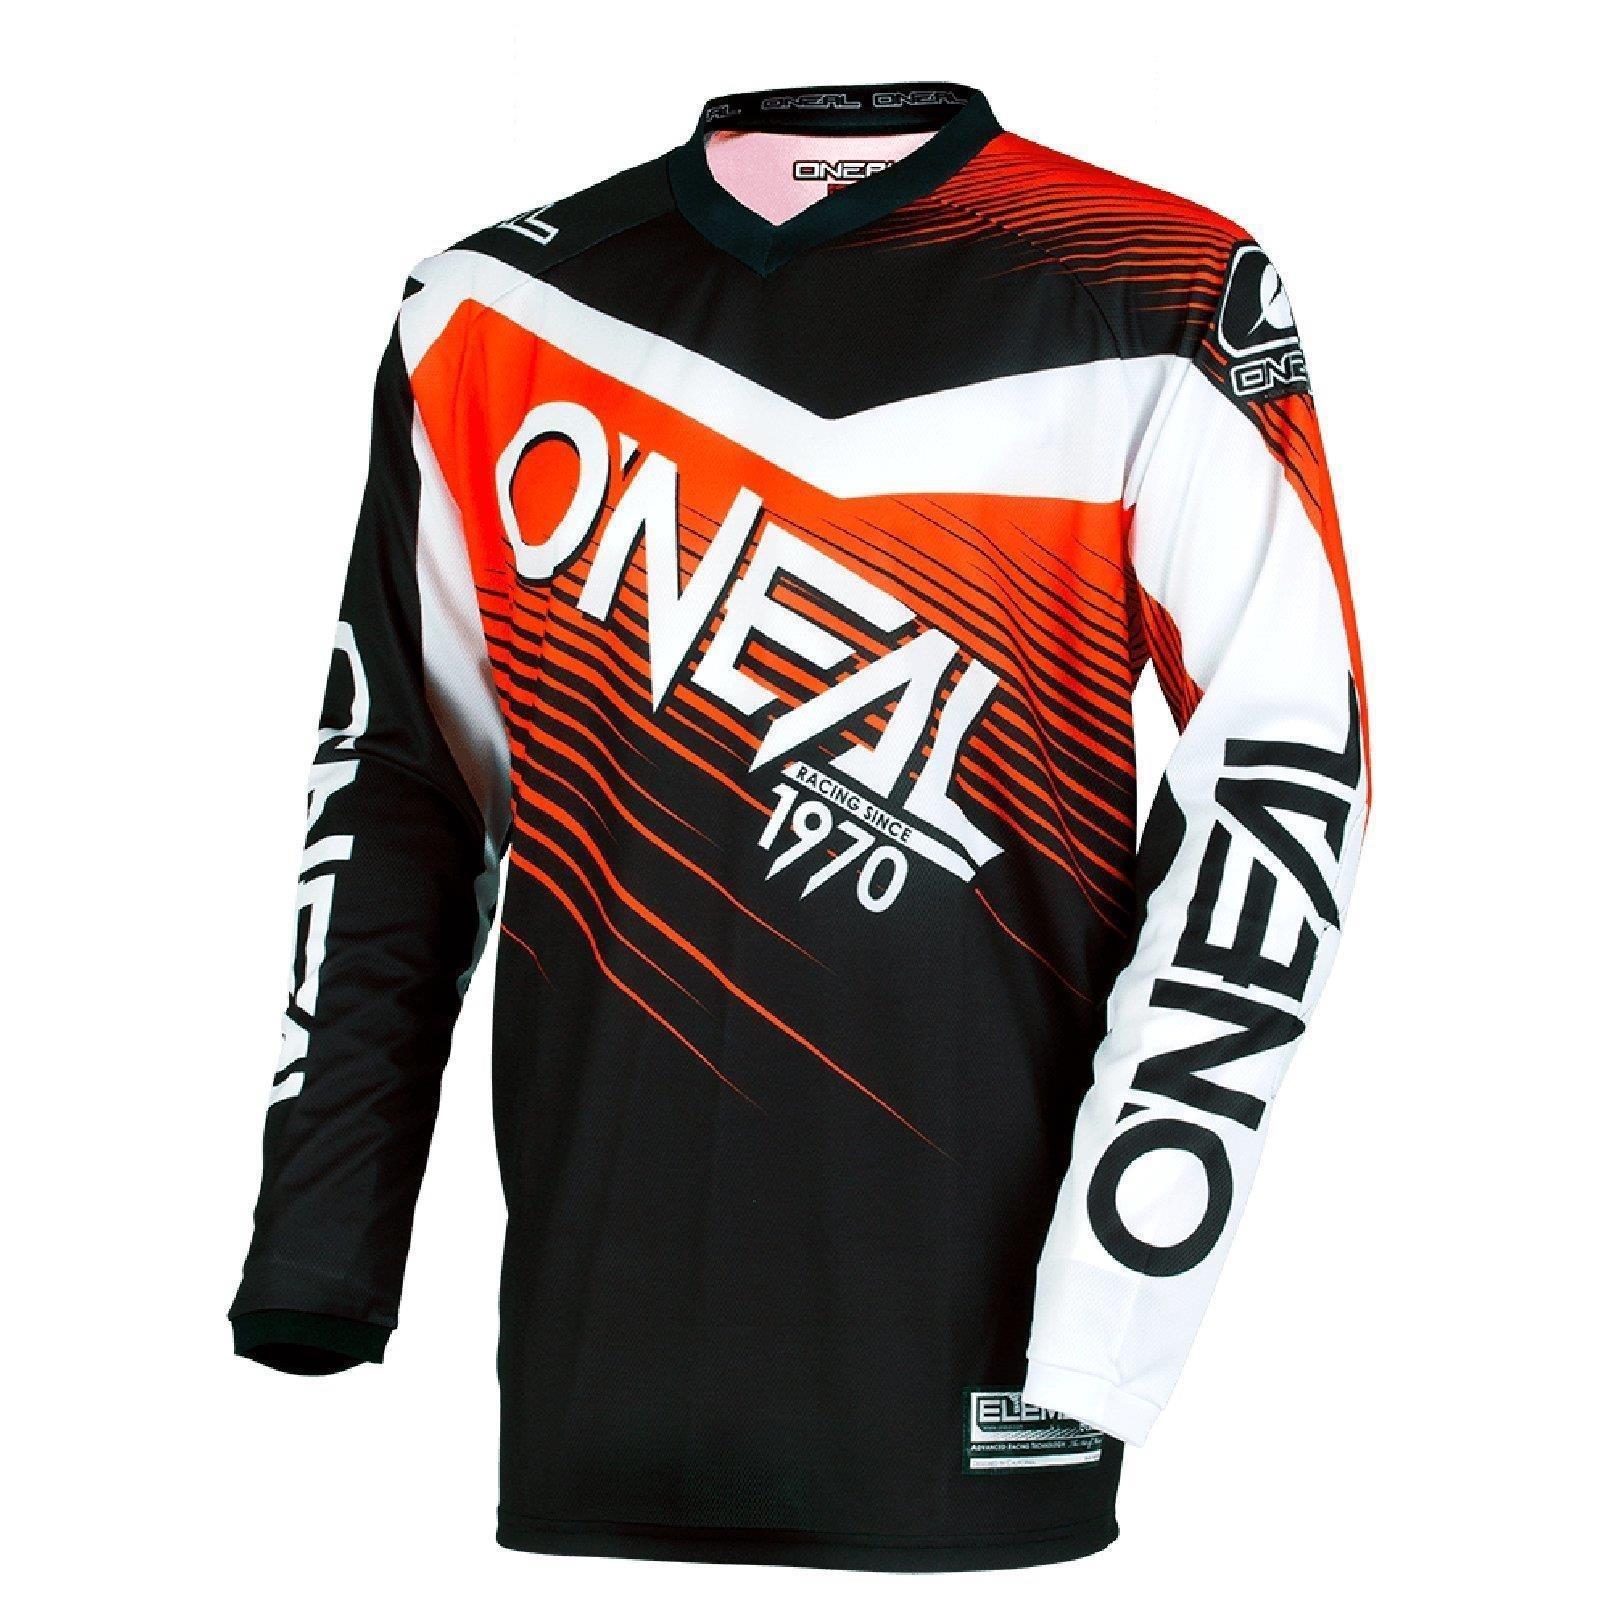 Elemento-oNeal-racewear-Jersey-pantalones-a-ninos-adulto-Motocross-Enduro-downhill miniatura 12